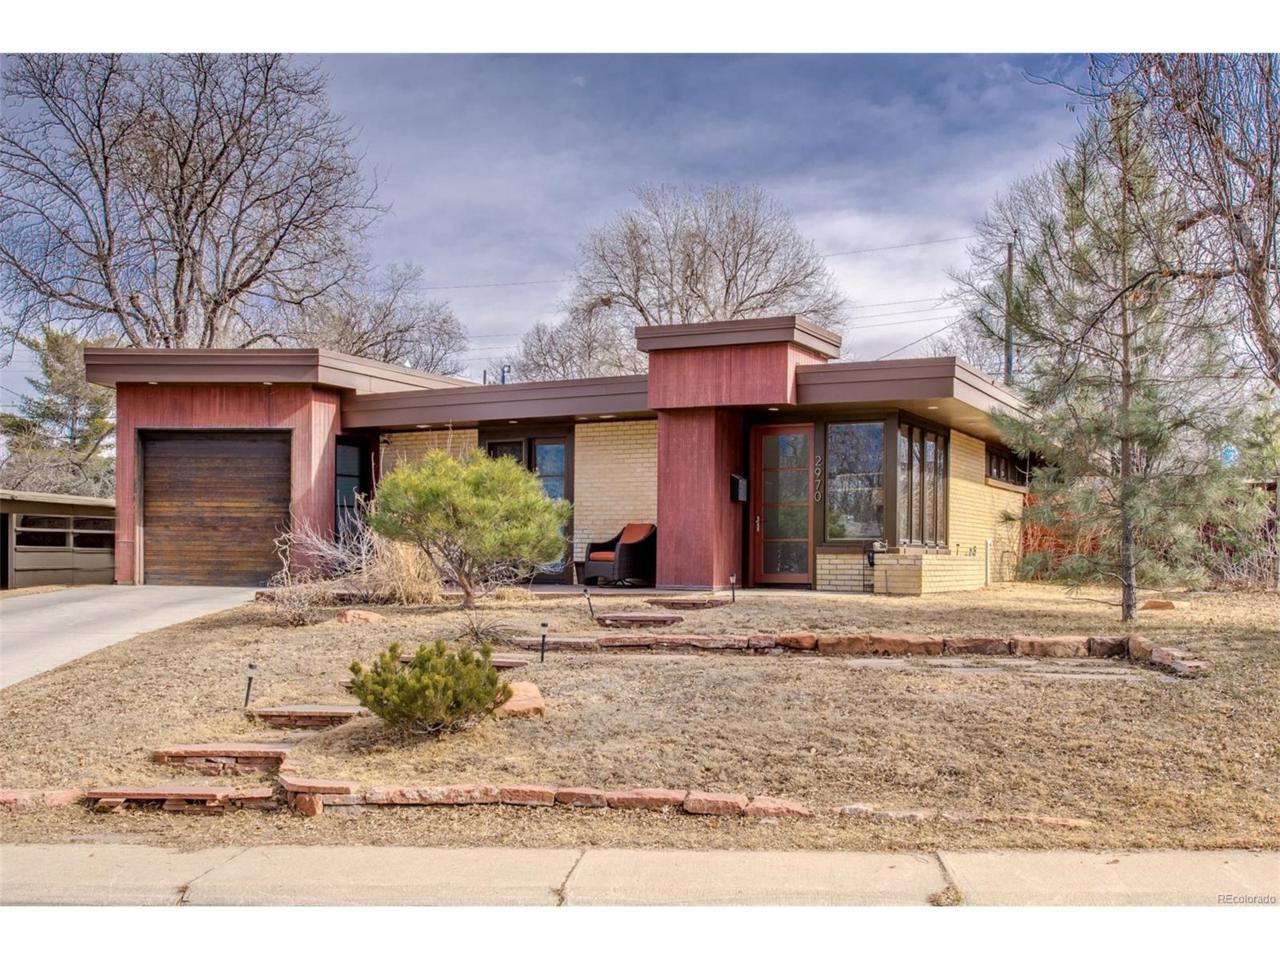 2970 S Marion Street, Englewood, CO 80113 (#3458032) :: The Peak Properties Group